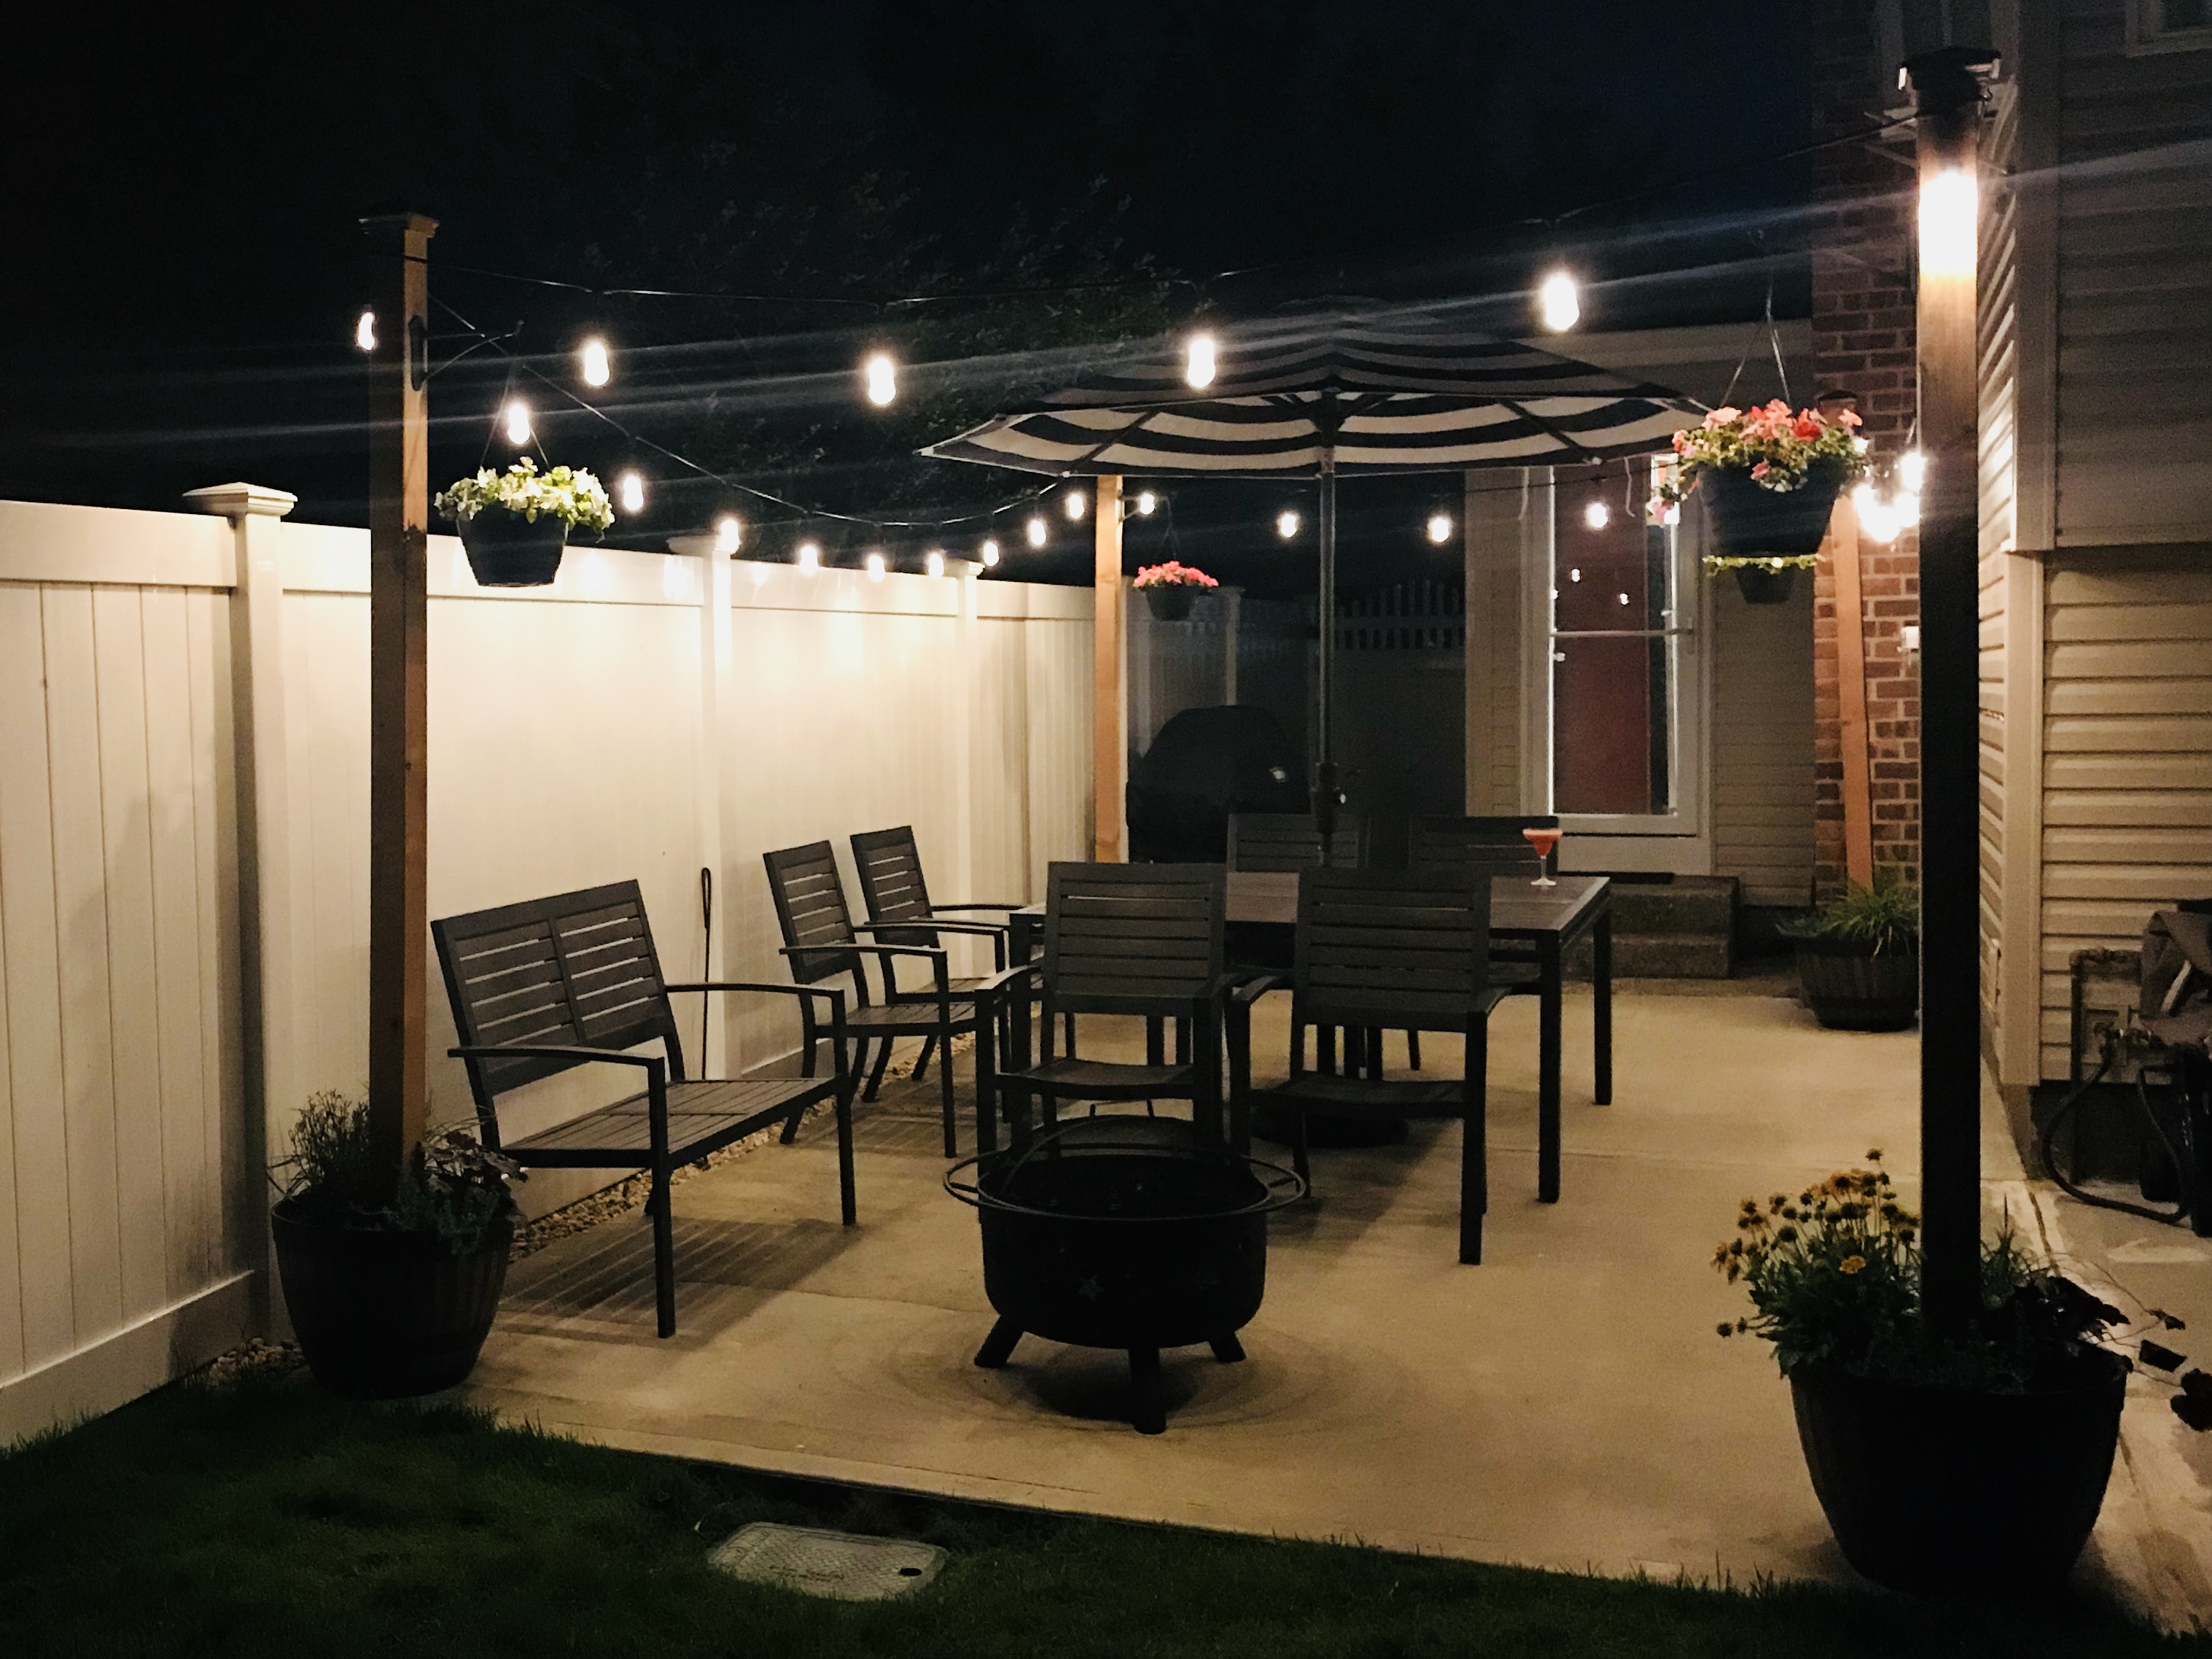 diy patio decor string lights on planter posts - Patio Decor